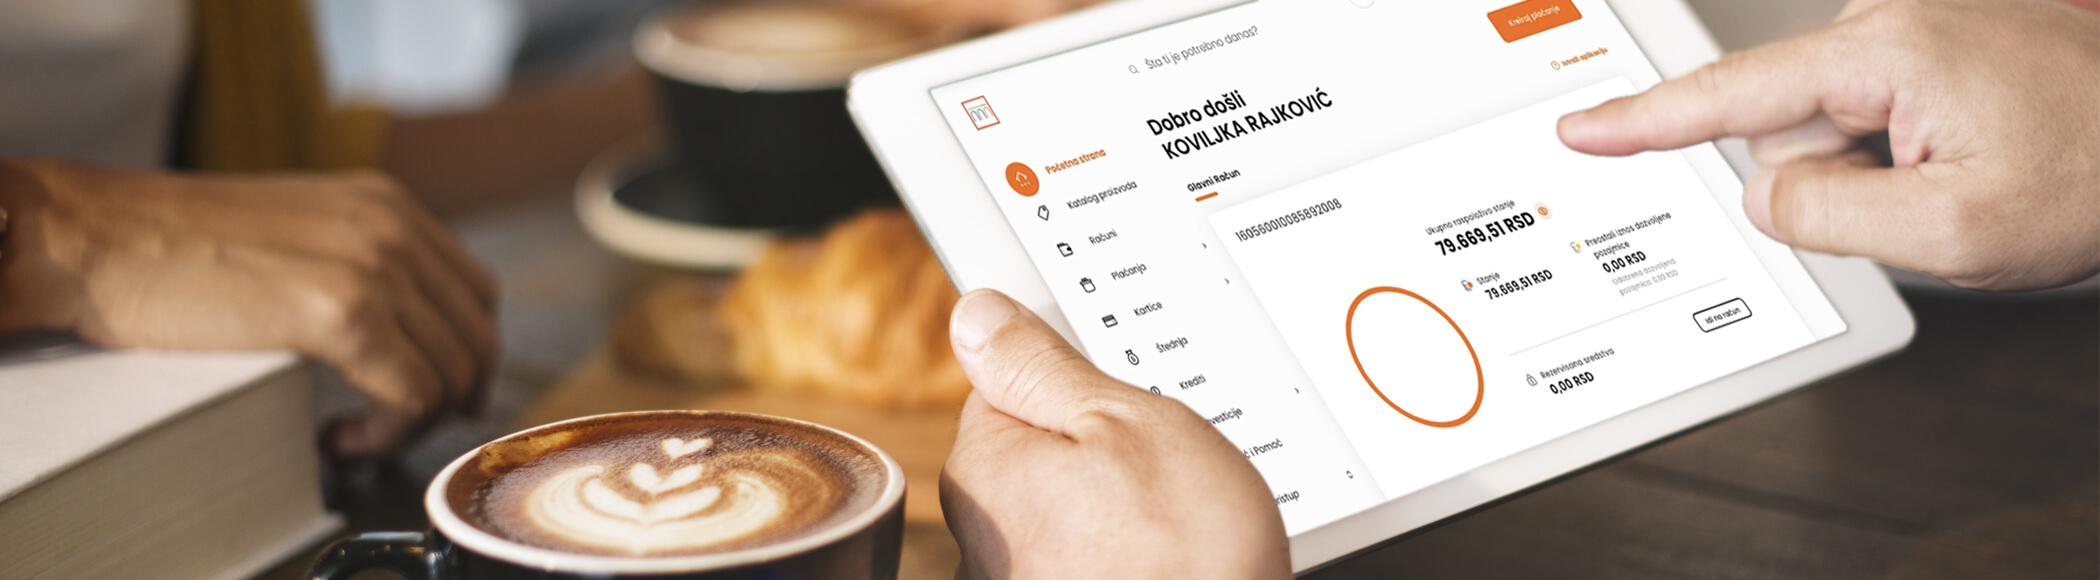 digitalno bankarstvo intesa online banca intesa